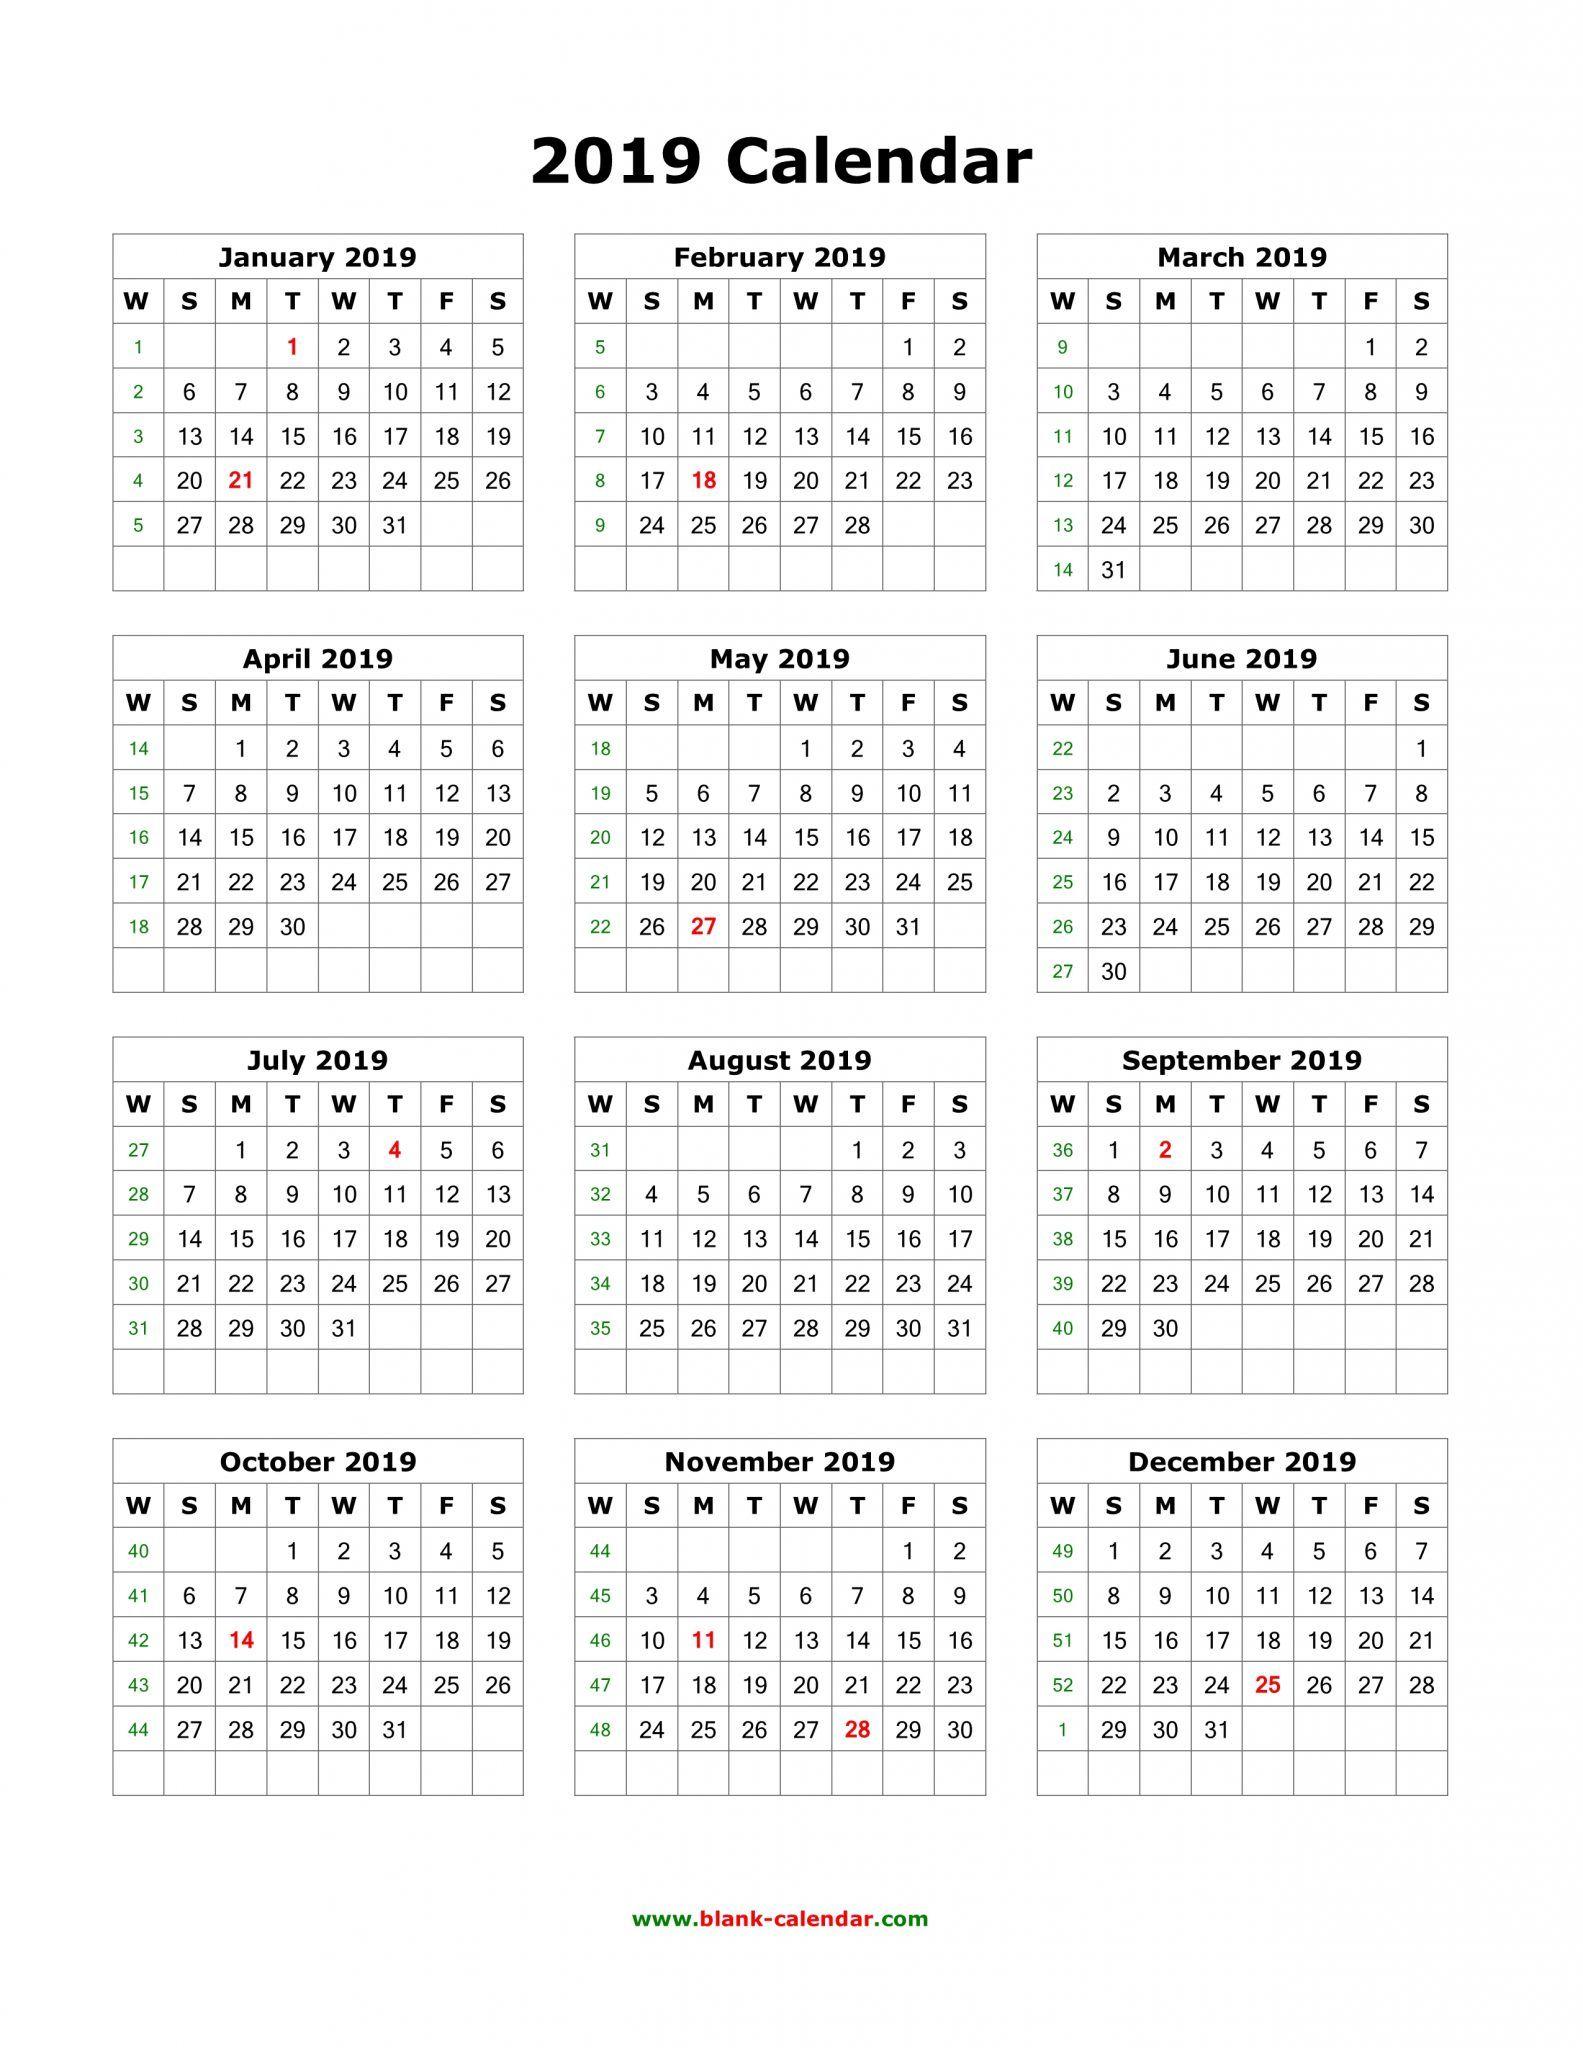 Download Blank 2019 Calendar Templates | 12 Month Calendar In One inside Blank 4 Week Calendar Printable